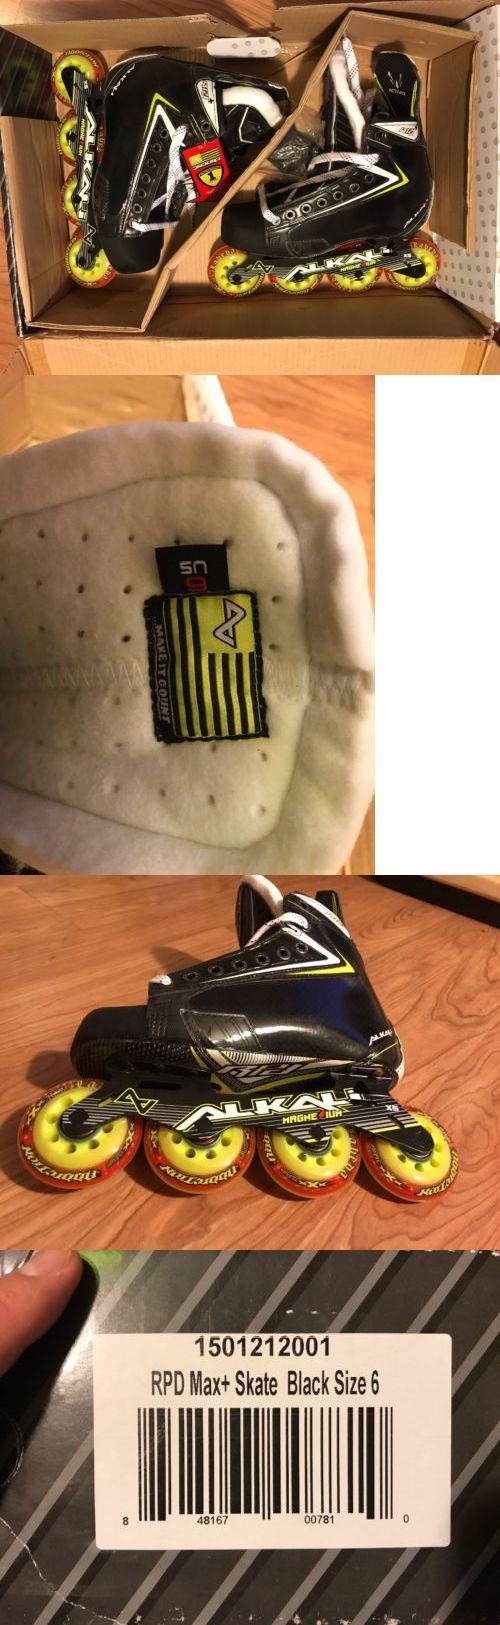 Roller Hockey 64669: *Brand New* Alkali Rpd+ Roller Hockey Skates Size 6 -> BUY IT NOW ONLY: $287.65 on eBay!